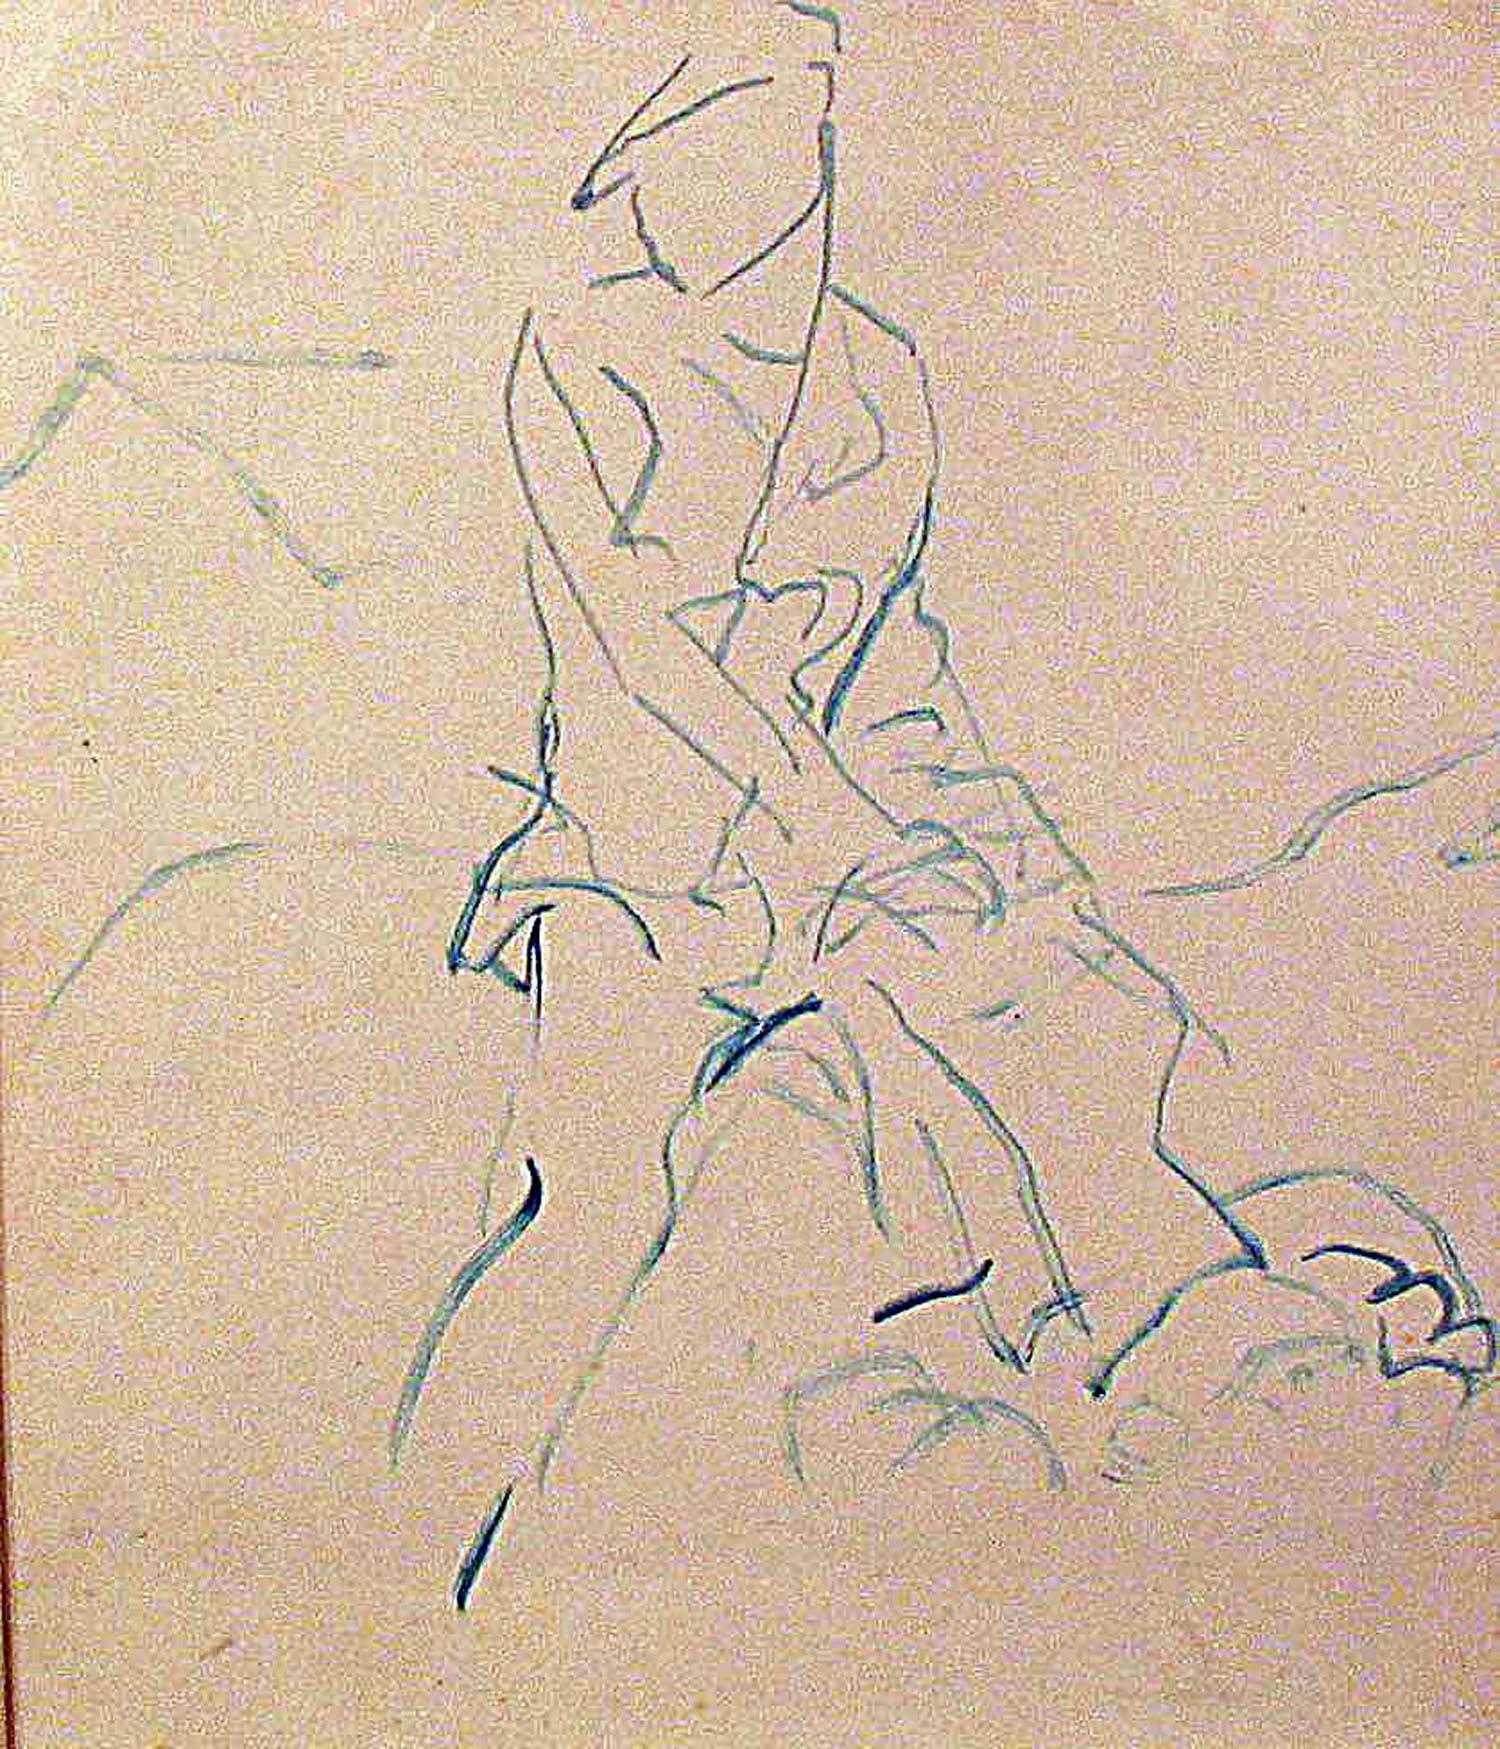 Mary Swanzy_-_Figurative Drawing.jpg